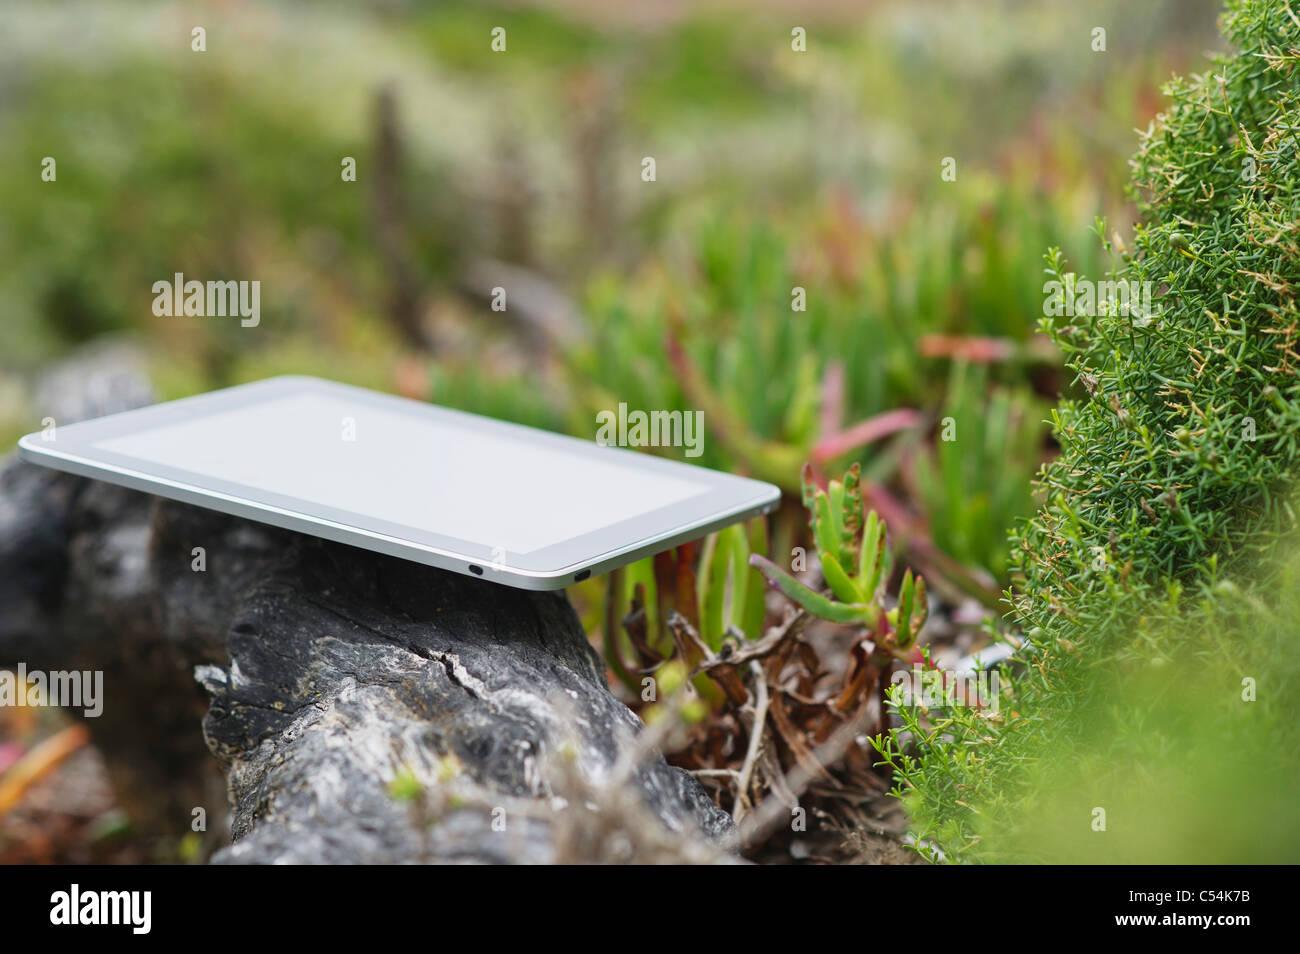 Digital tablet on rock - Stock Image